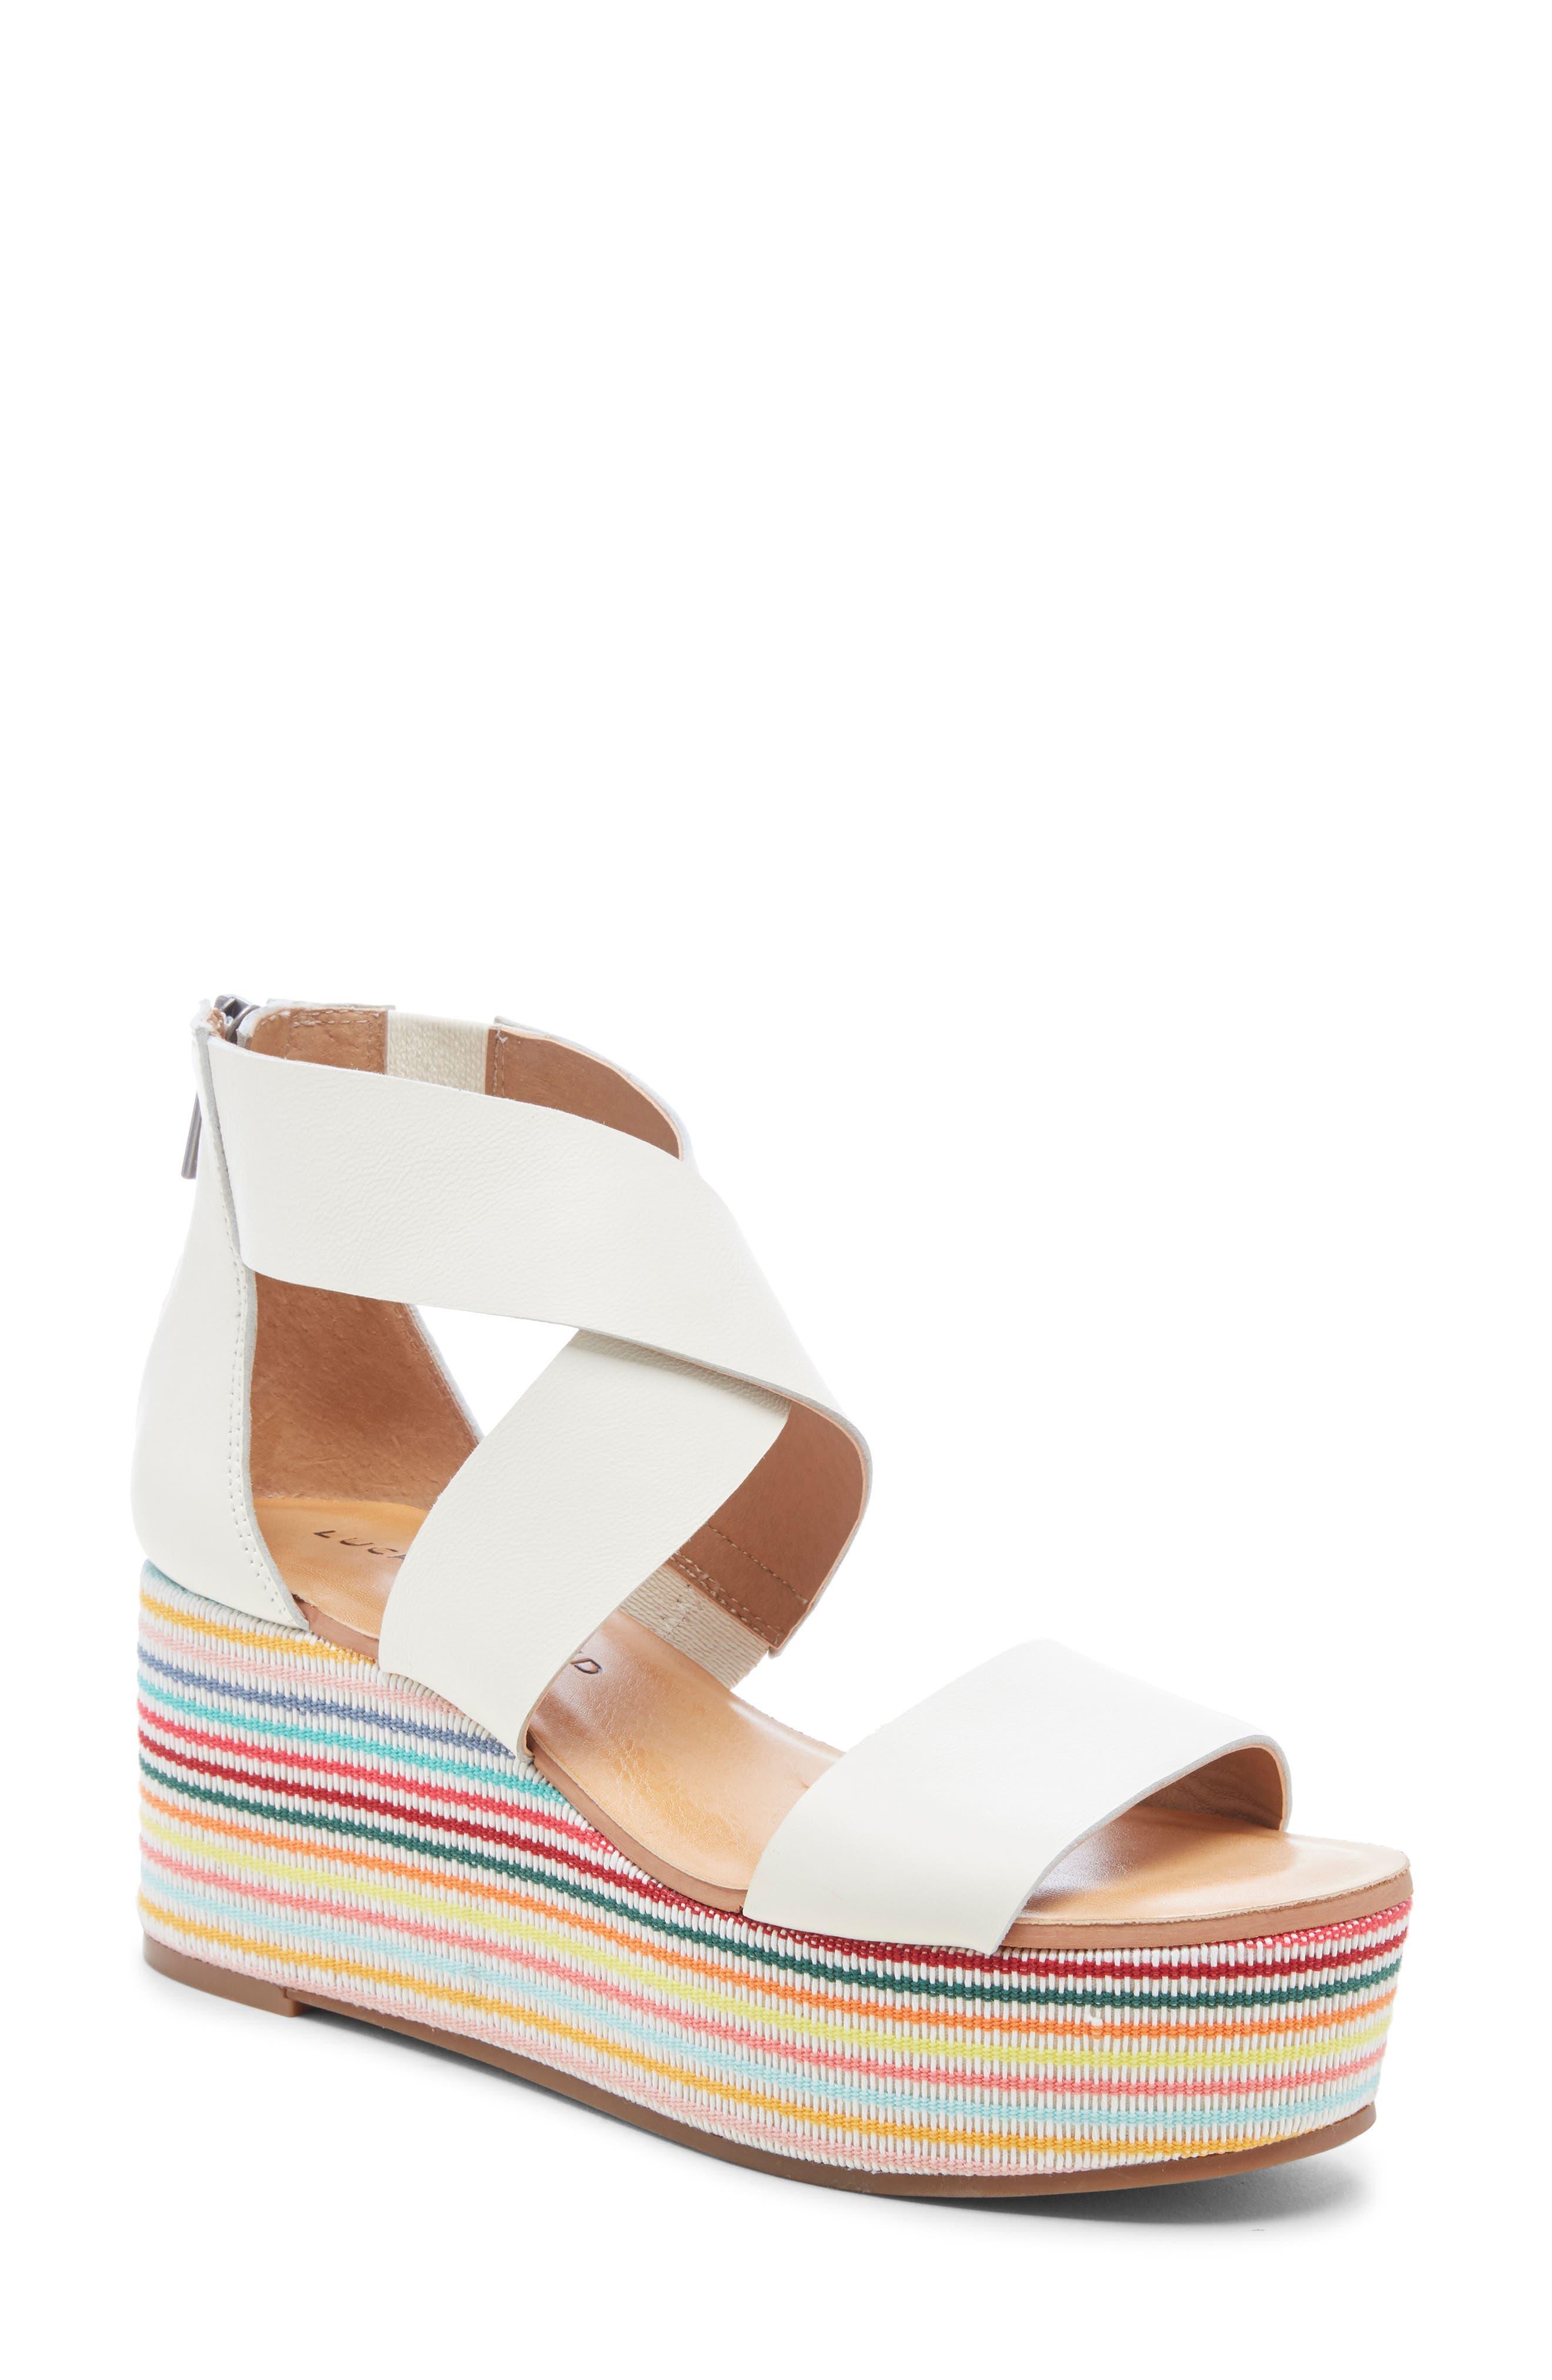 Lucky Brand Gwindolin Platform Wedge Sandal- White